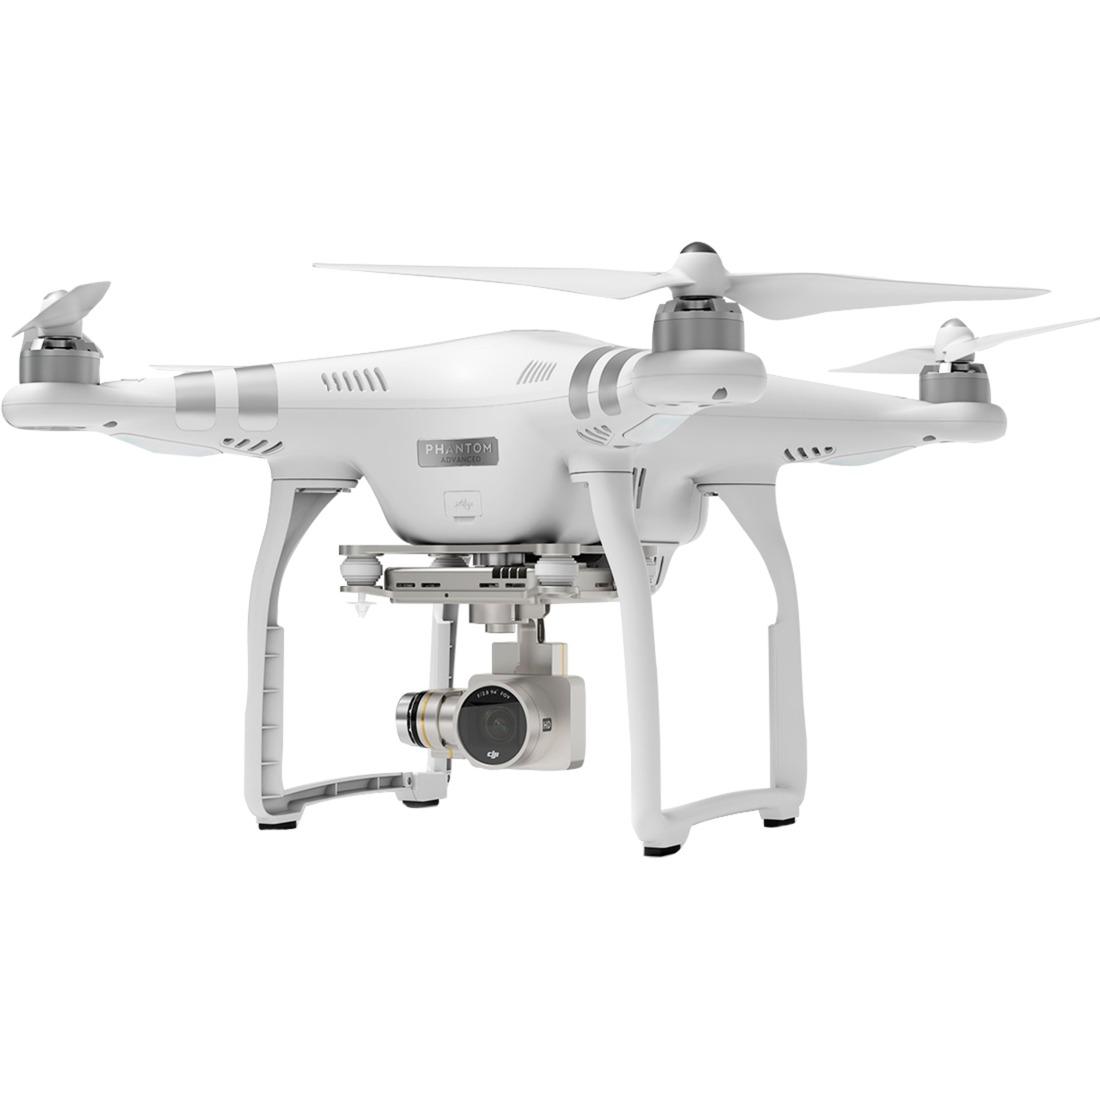 DJI Phantom 3 Advanced, Drohne